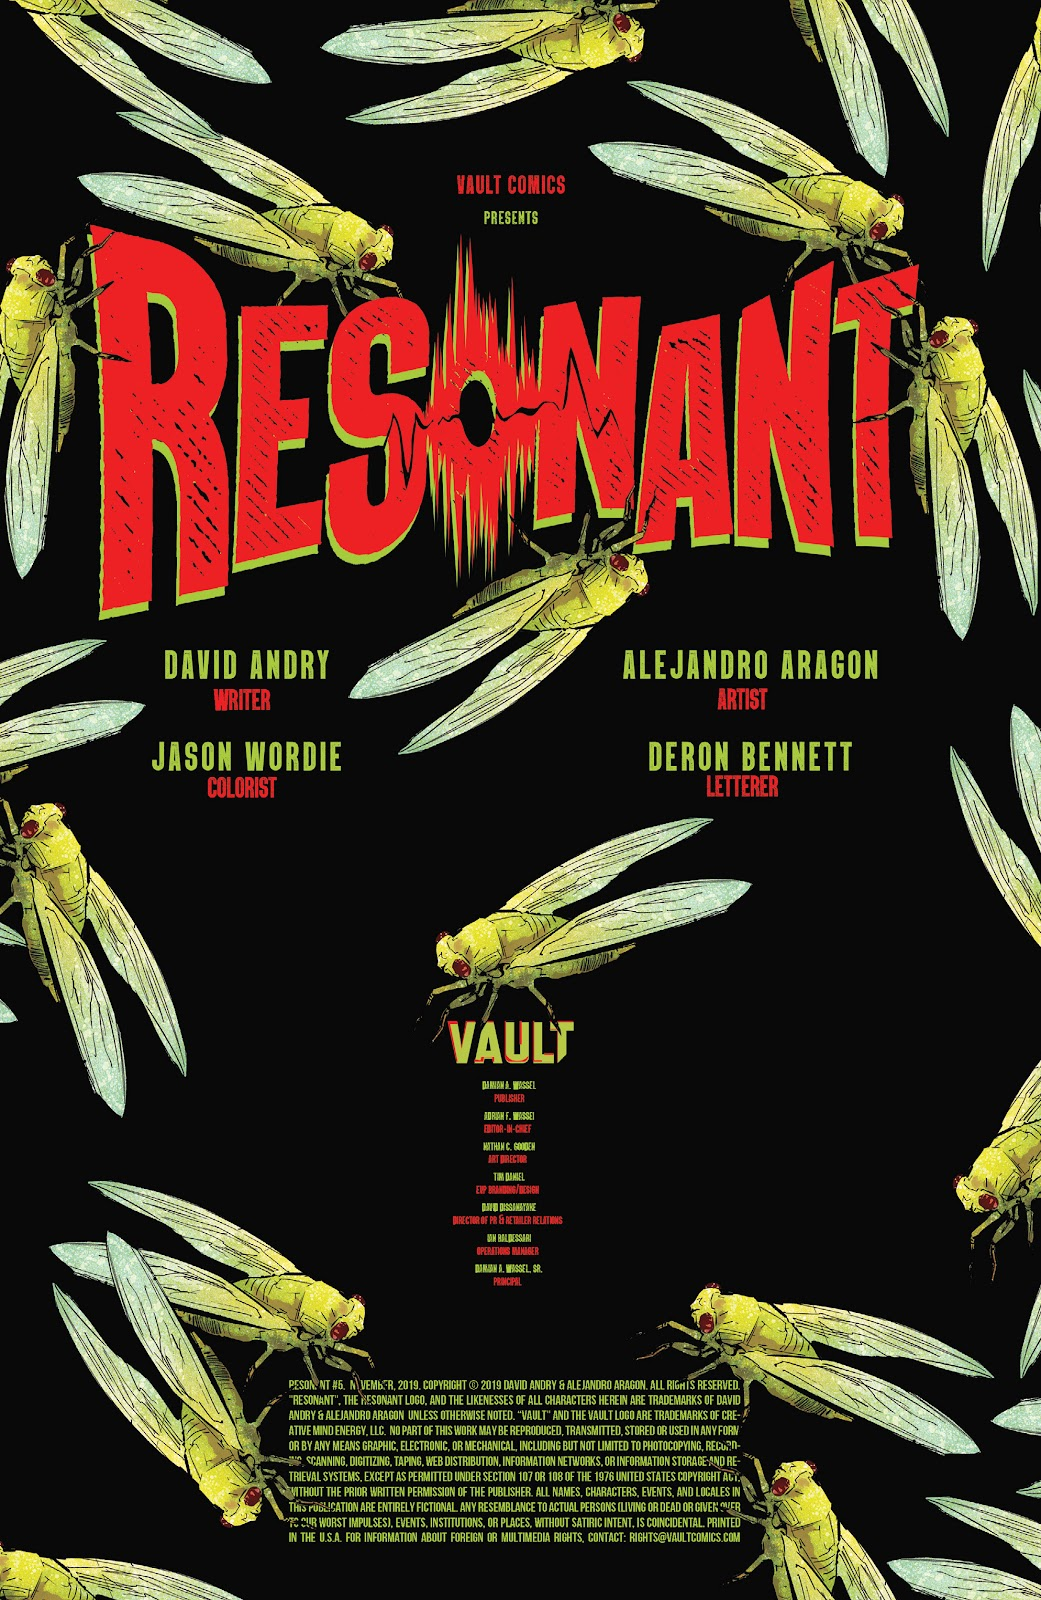 Read online Resonant comic -  Issue #5 - 2